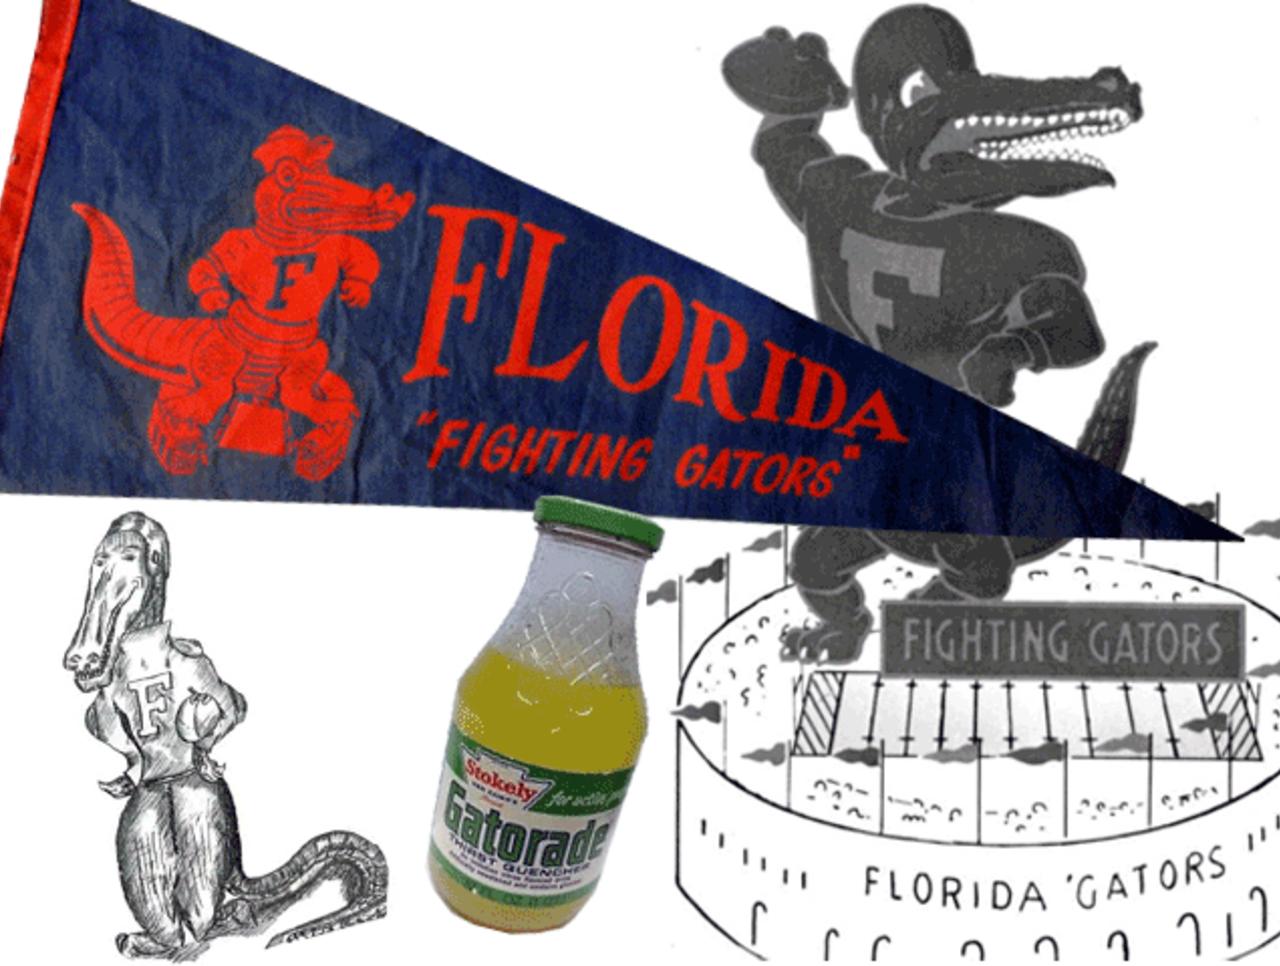 cropped_Florida_Gators.png?ts=1396444927